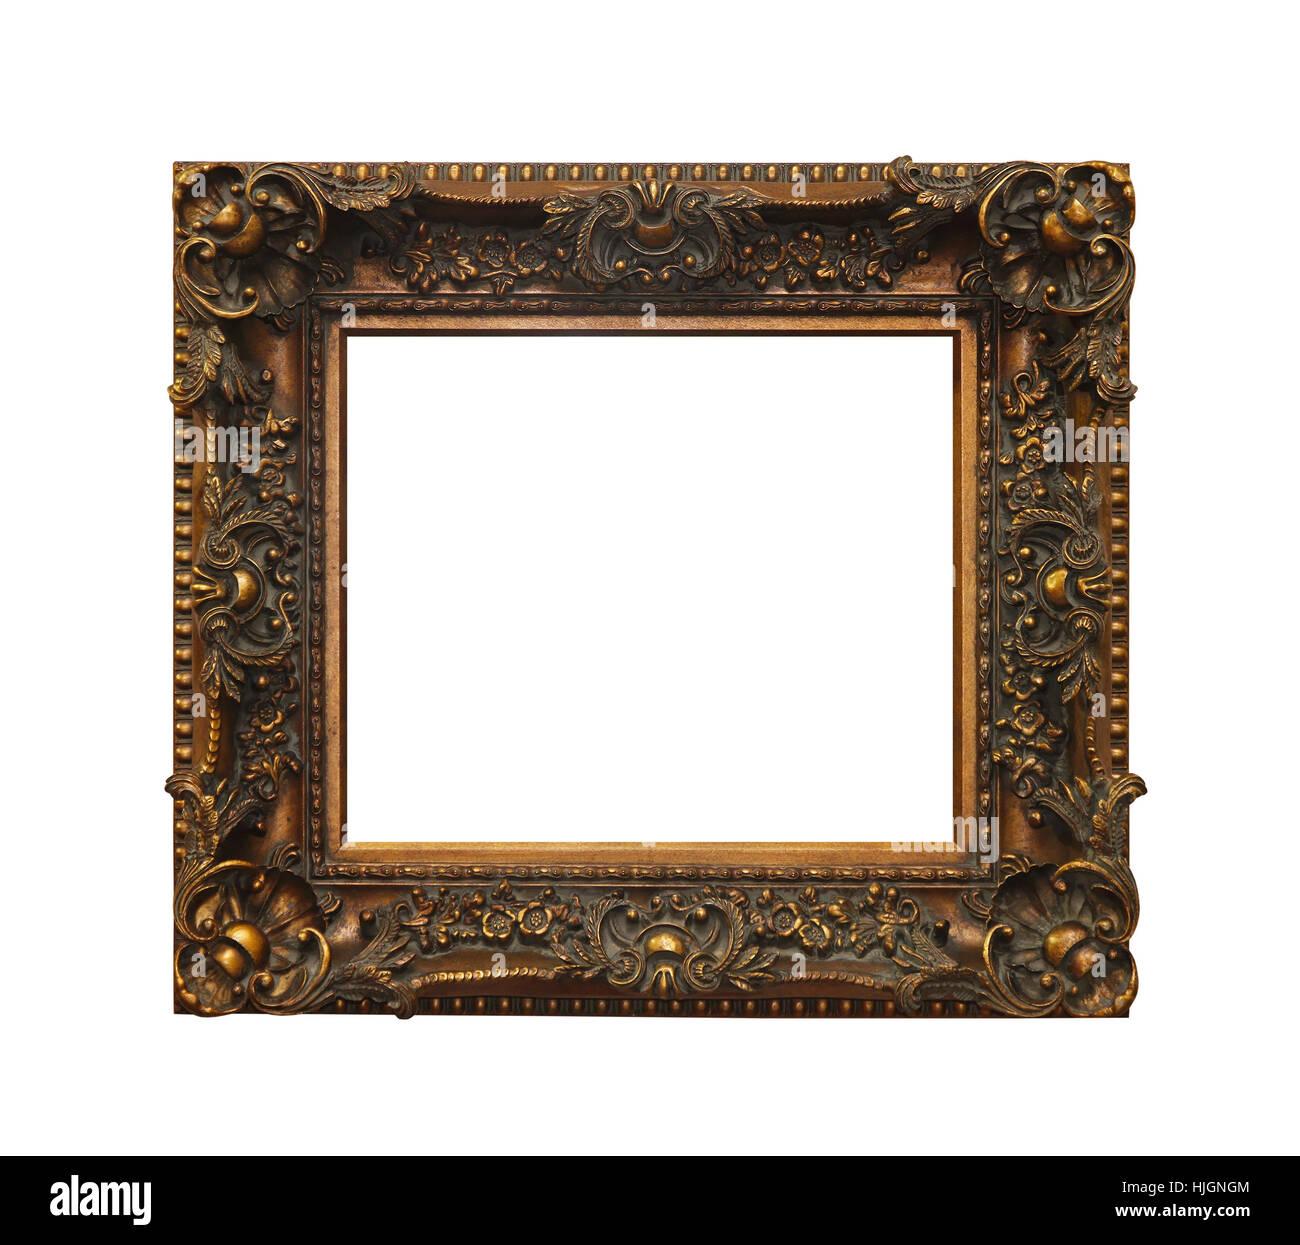 Kunst, isoliert, antik, rechteckig, Rahmen, Bronze, Rahmen, Rahmen ...